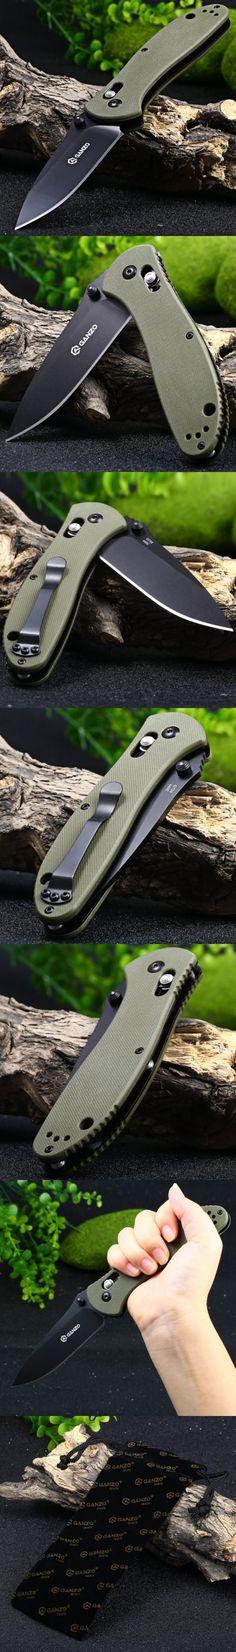 Pocket Knives and Folding Knives   Ganzo G7393-GR Axis Lock Pocket Knife $15.50